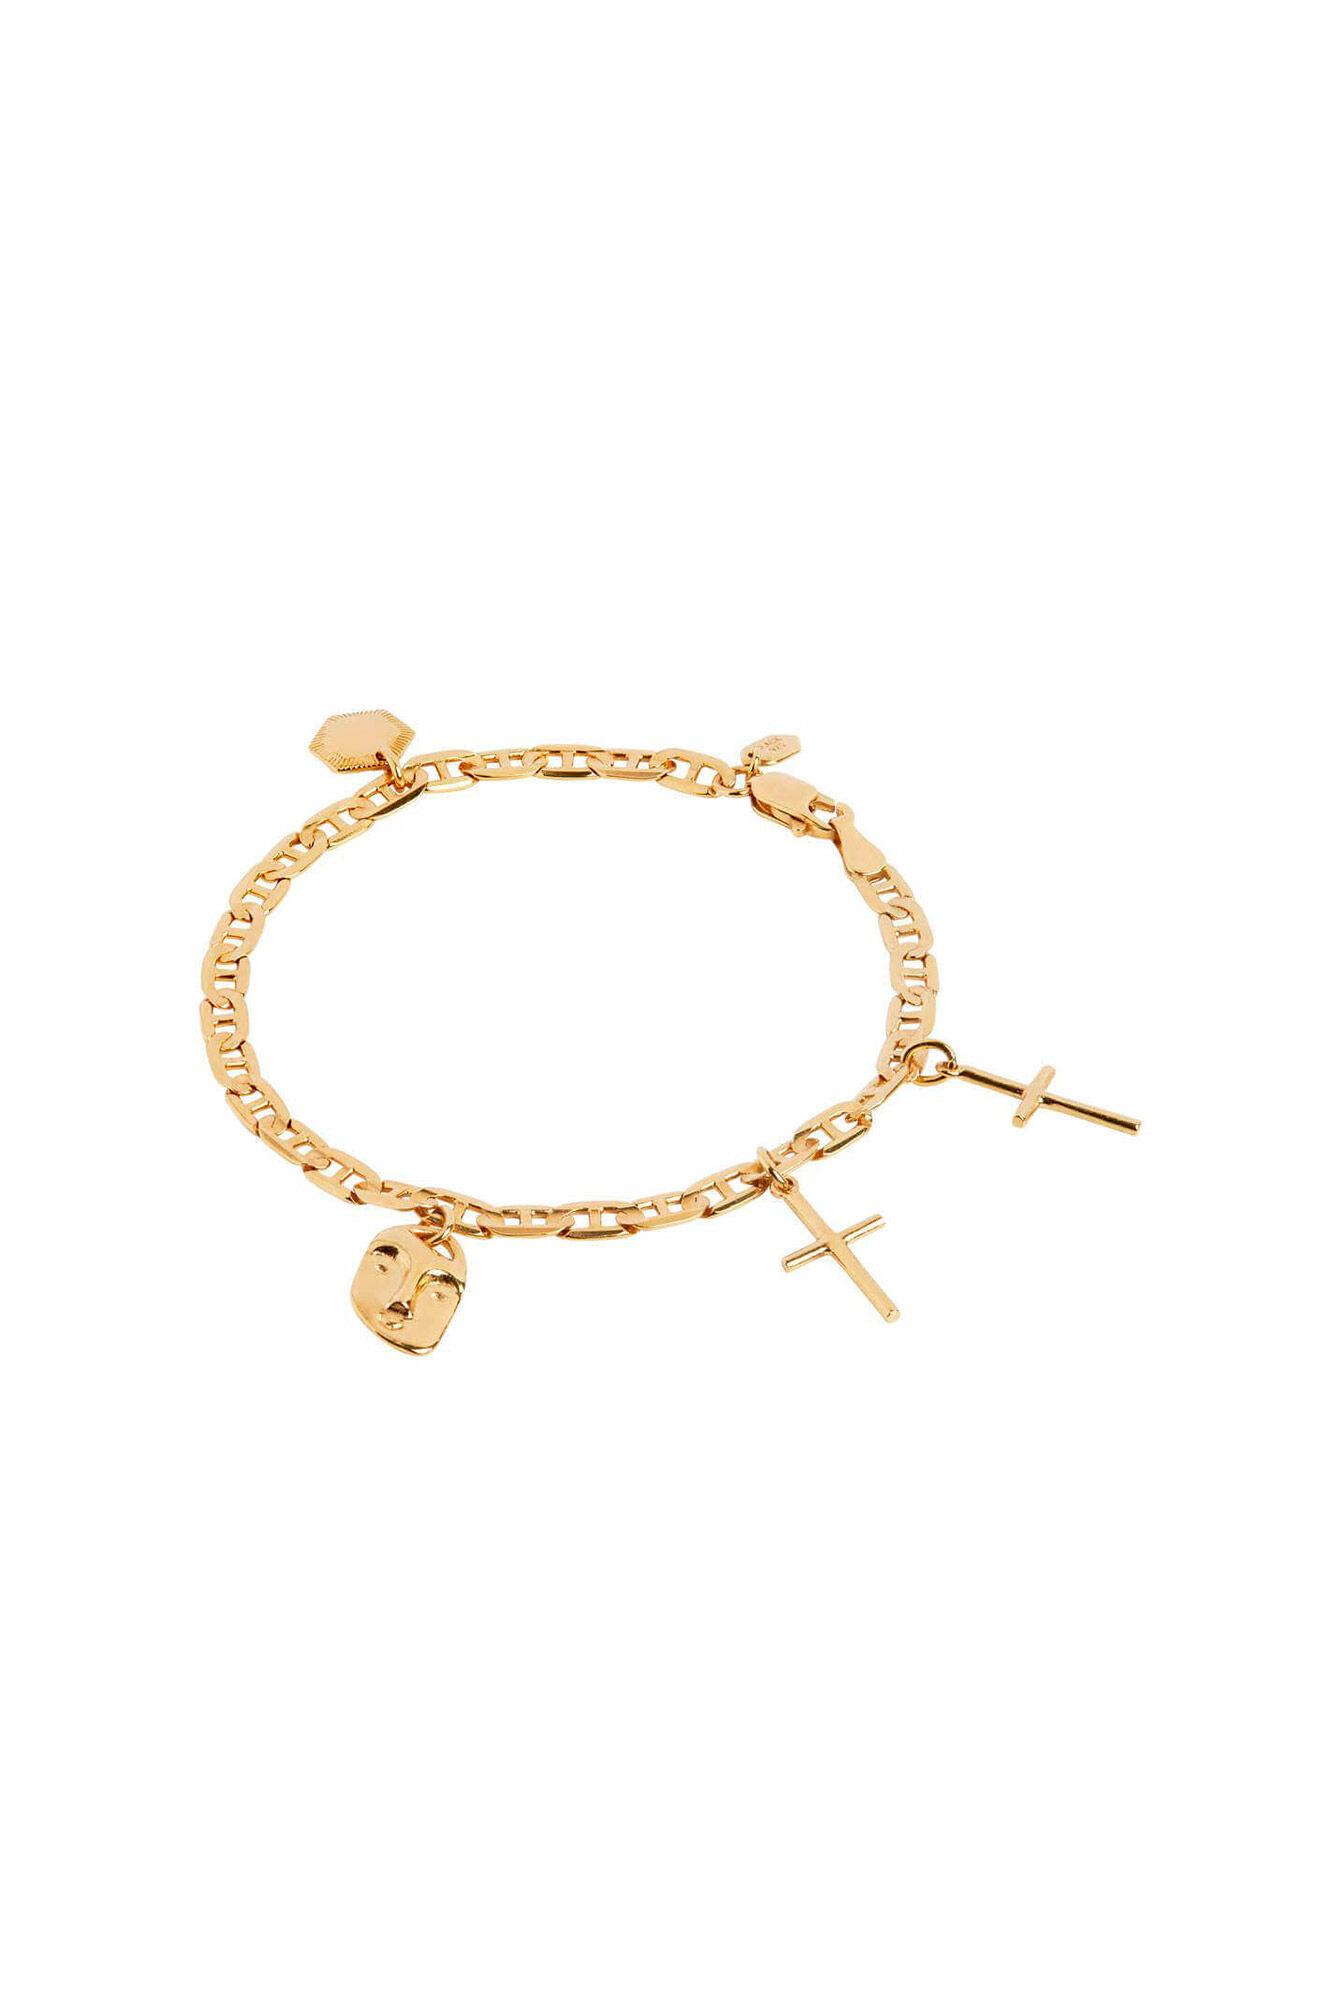 Friend charm bracelet 400232YG, GOLD HP